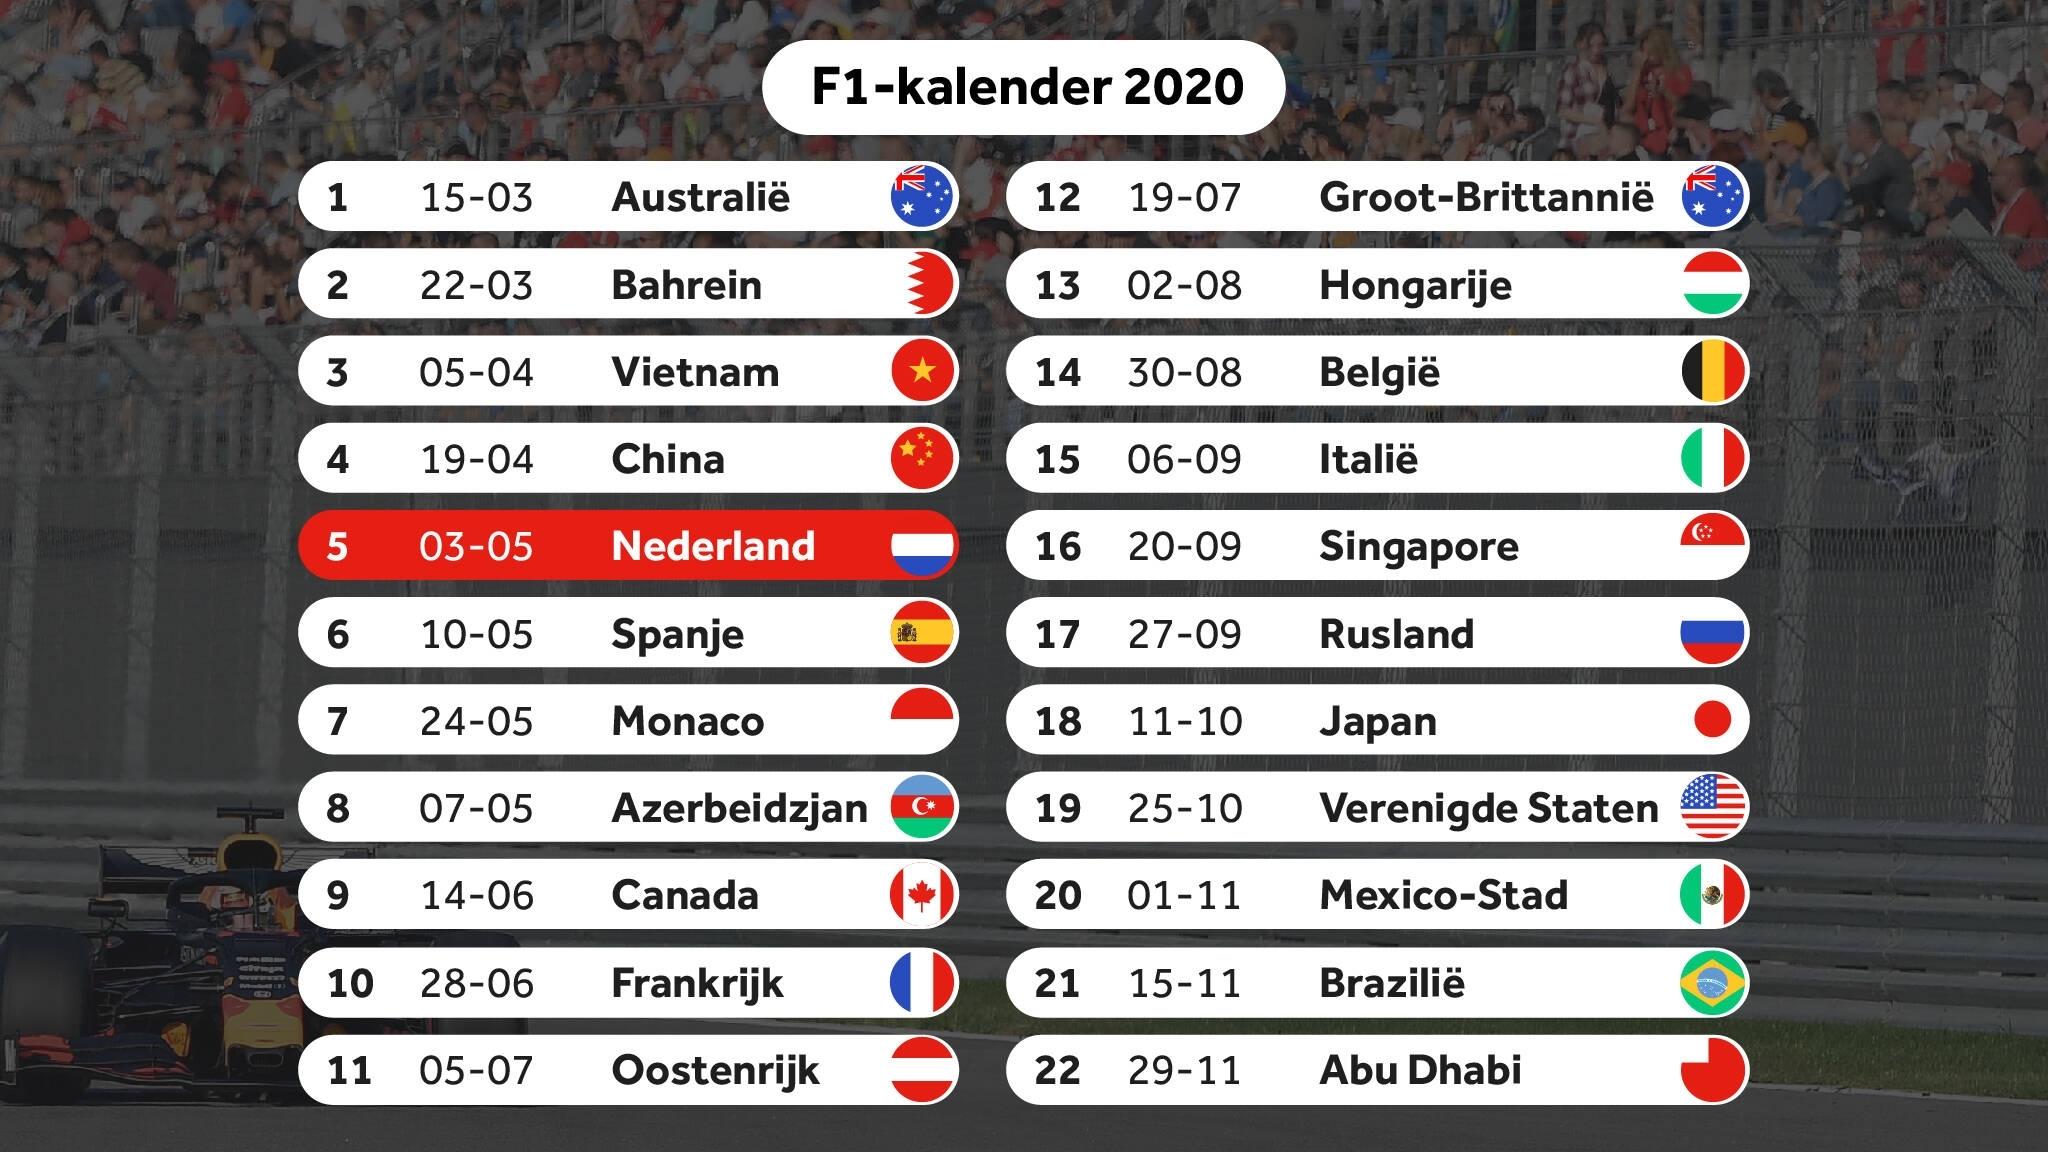 F1 Kalender 2020. Year 2020 Calendar. 2019-08-15